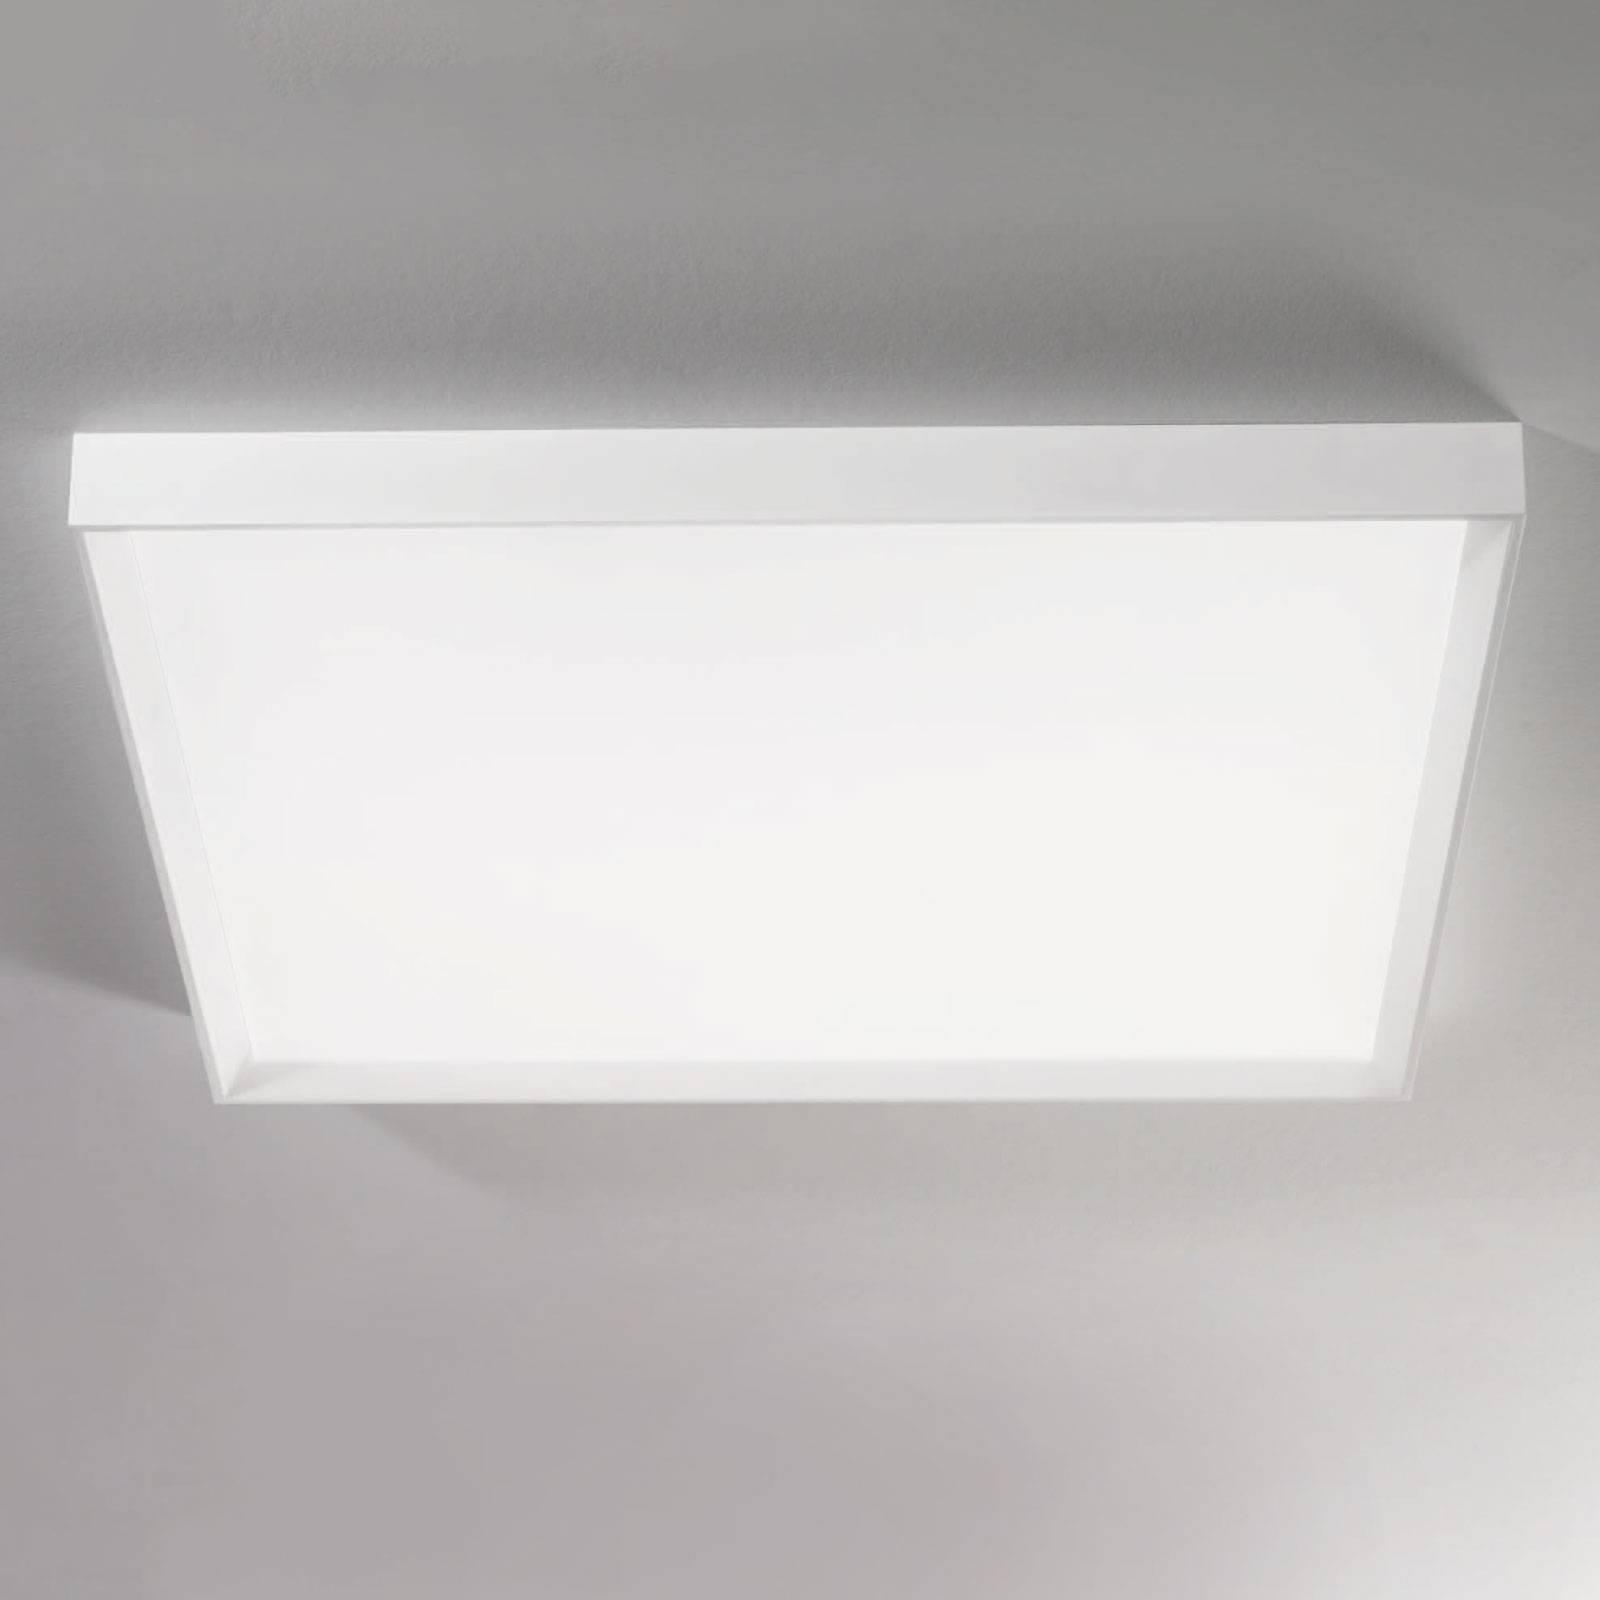 LED-Deckenleuchte Tara mega, 89 cm x 89 cm